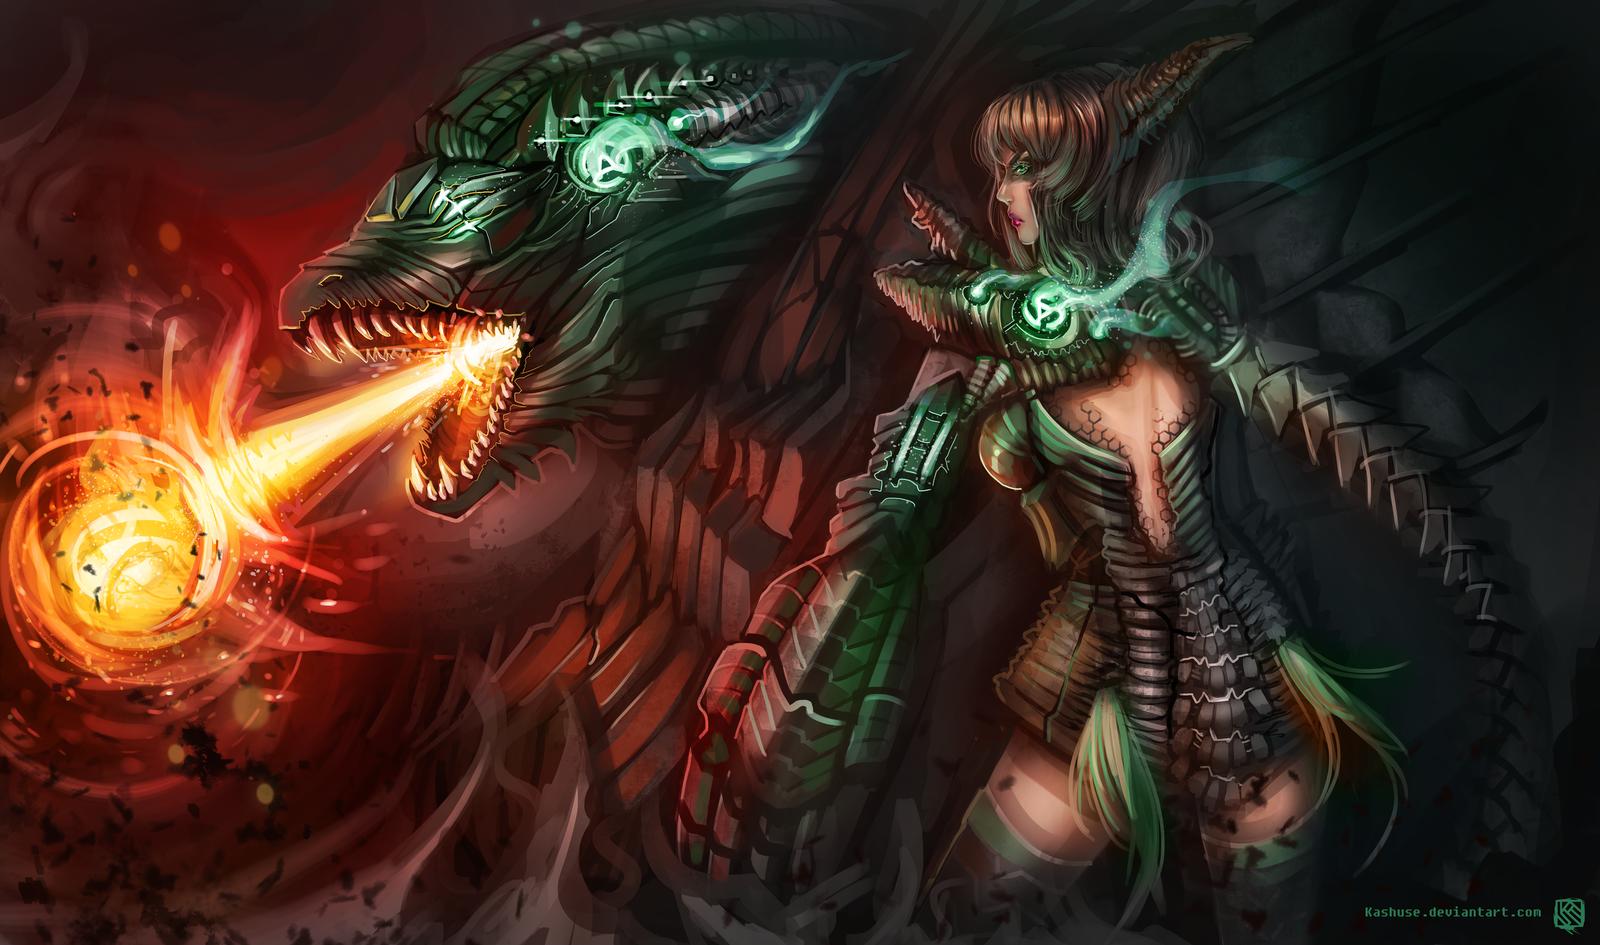 League of Legends_Shyvana_Headhunter_Splash by Kashuse